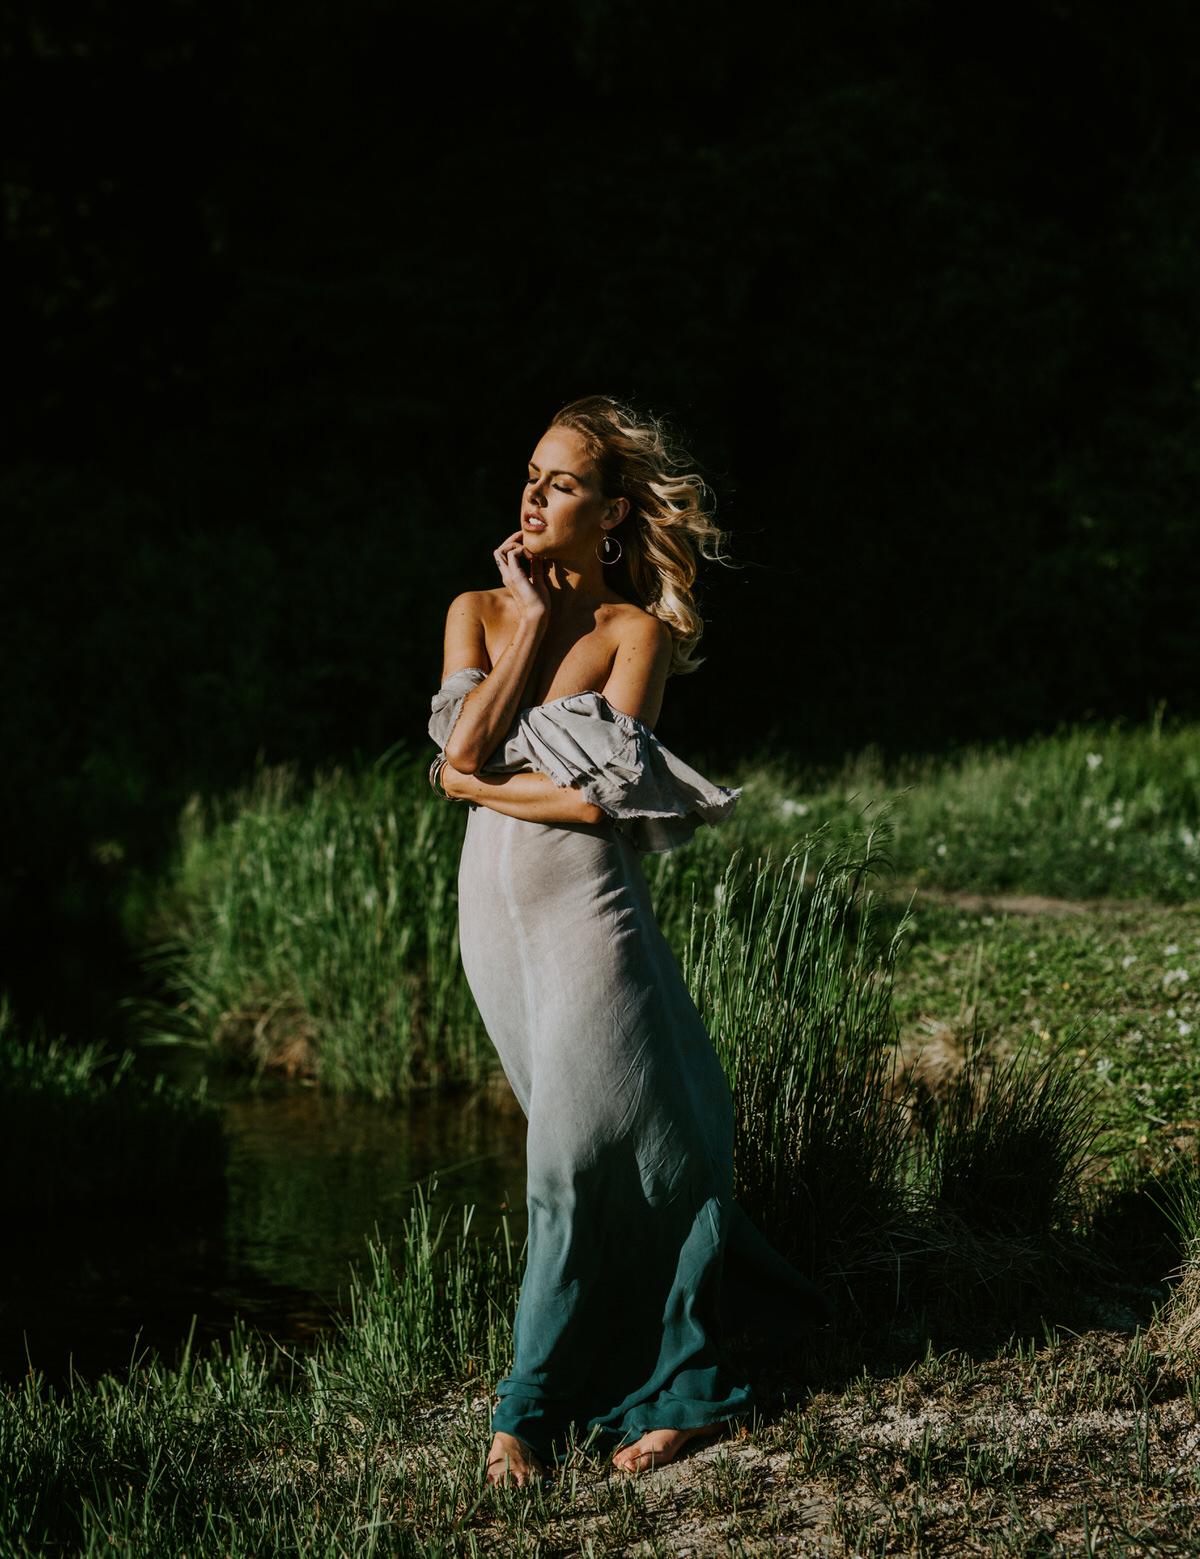 Heidi Gwaii Portraits - Vancouver Wedding Photographer - Jennifer Picard Photography - IMG_8987.jpg